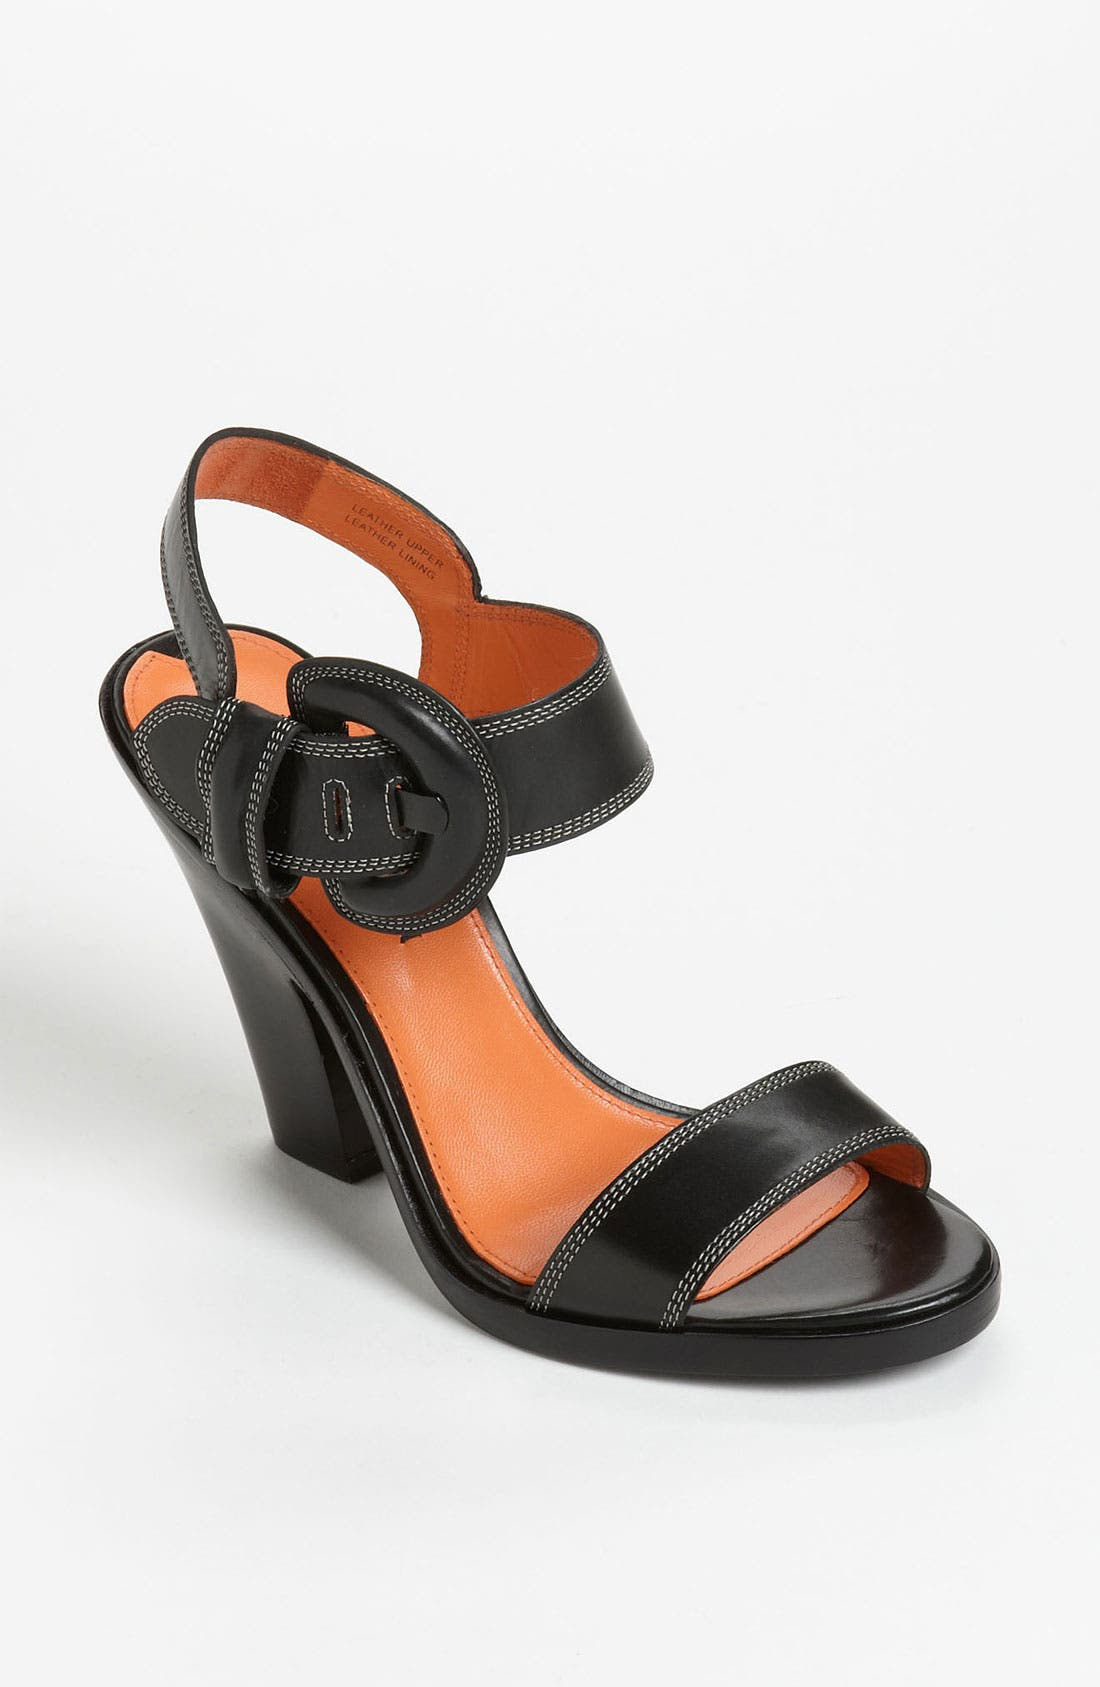 Main Image - Via Spiga 'Kia' Sandal